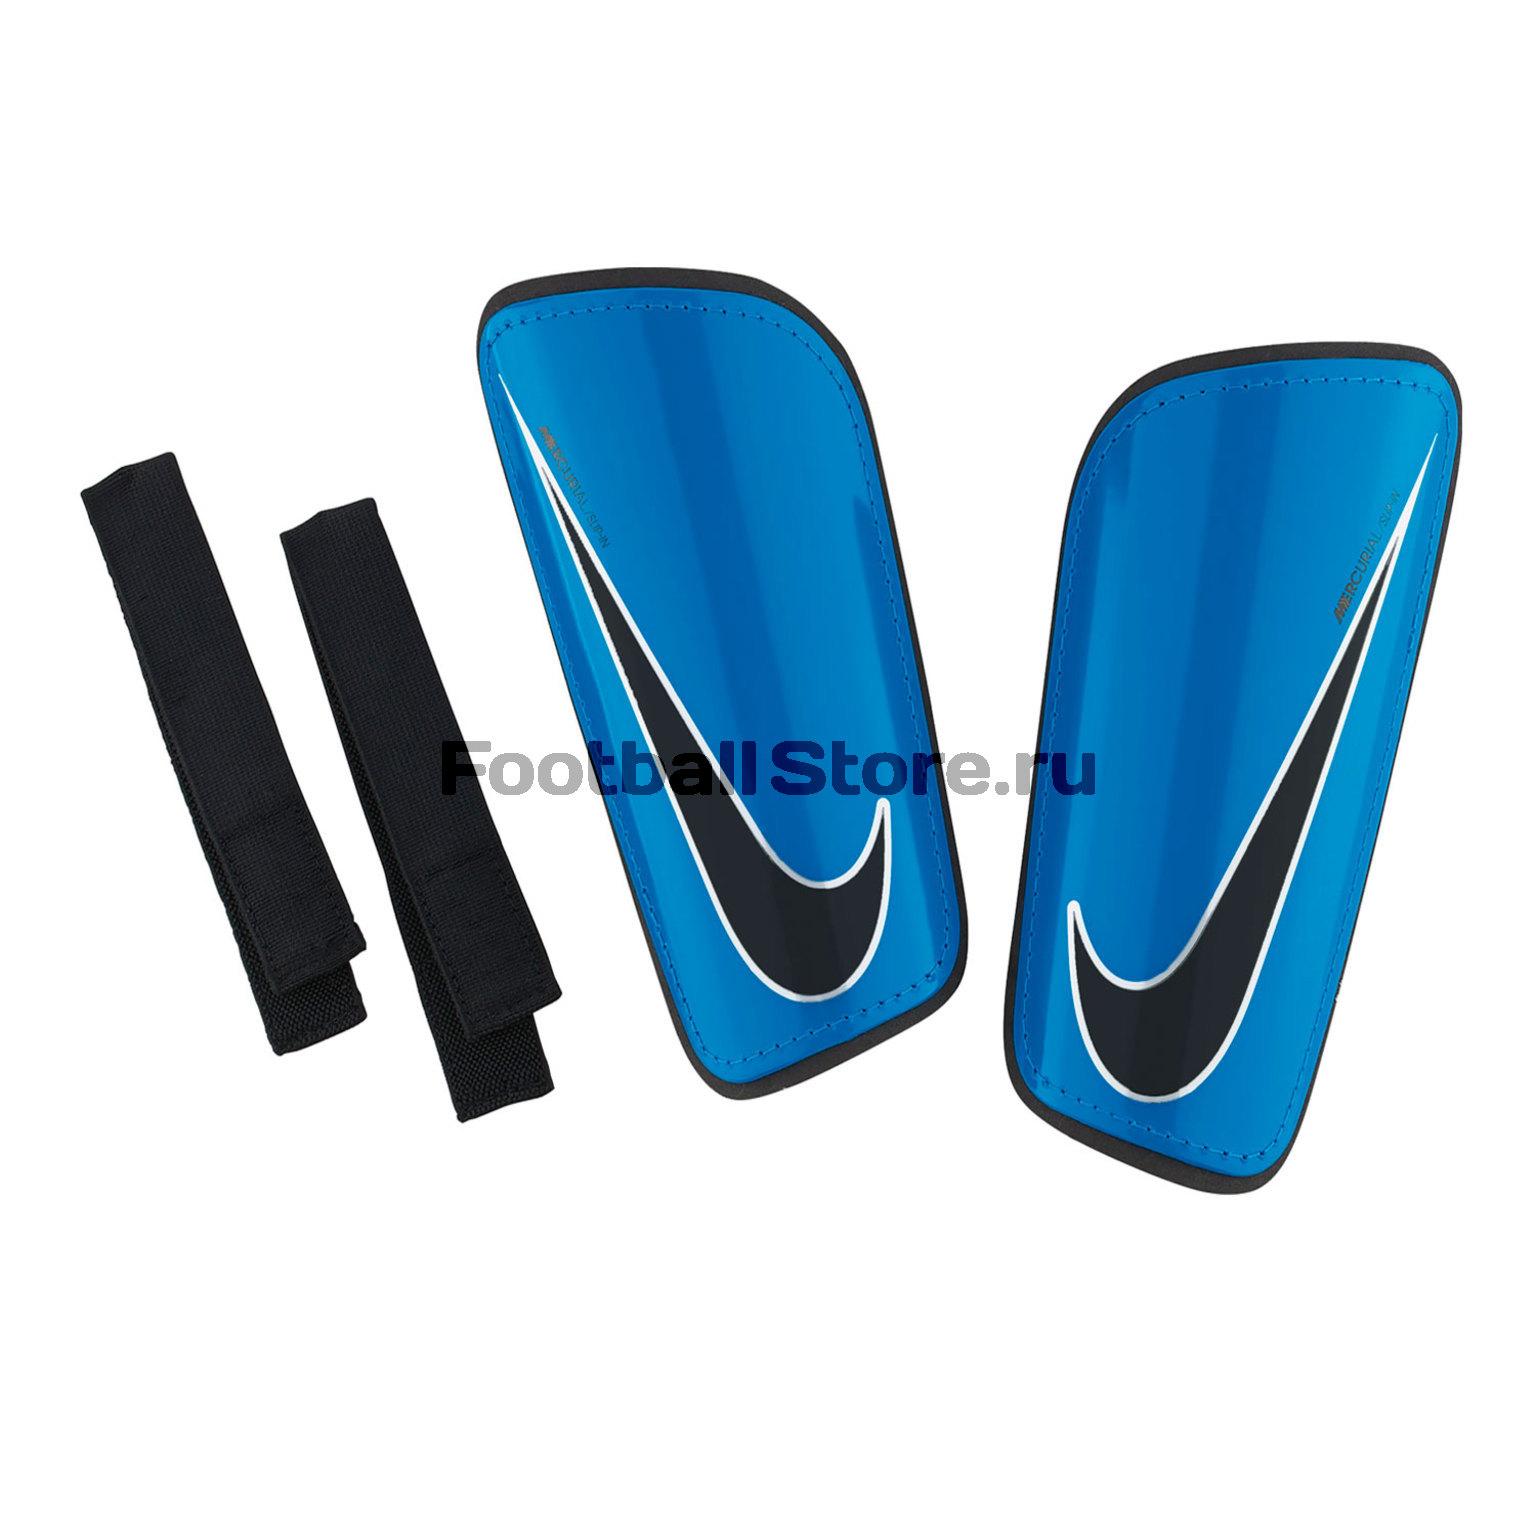 Защита ног Nike Щитки Nike NK Mercurial HRDSHL SP2101-406 защита nike защита nk hyprstrng mtch ankl slv